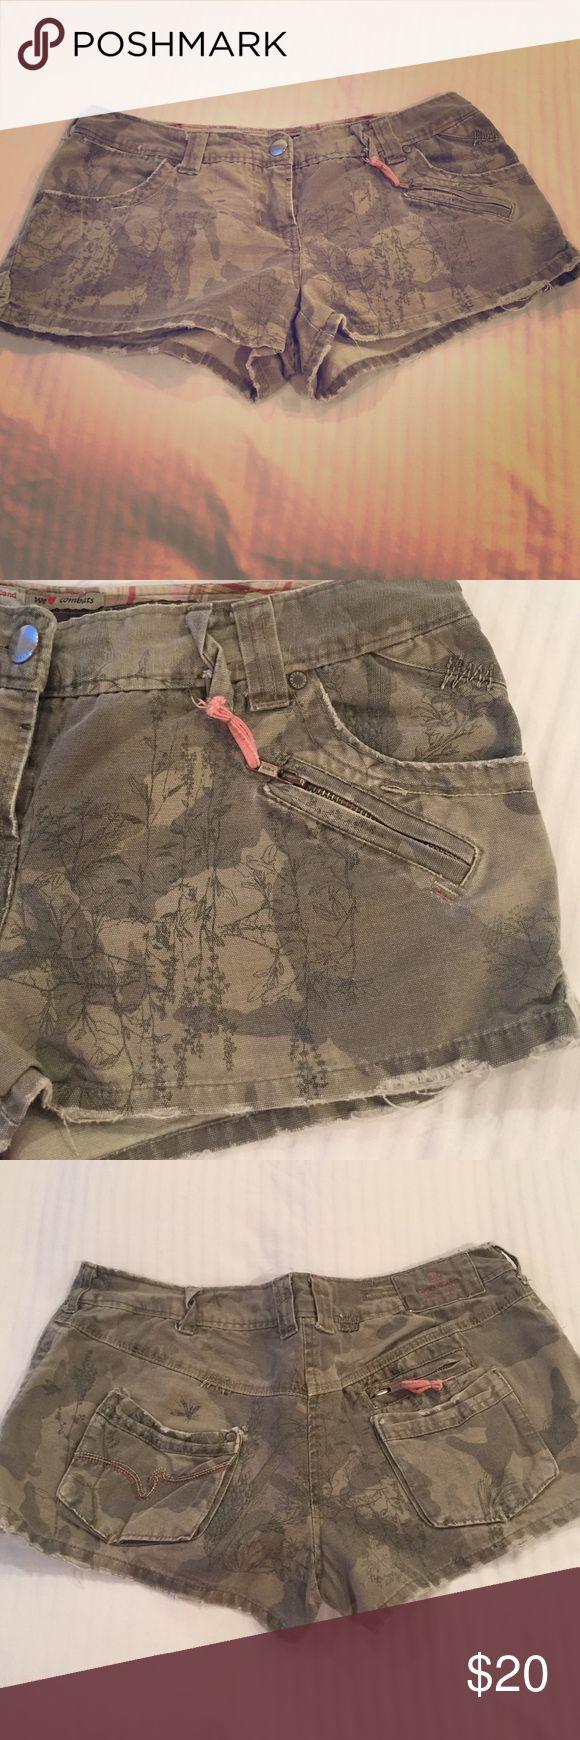 Cargo Army Shorts size U.K. 12 Cool cargo shorts, lots of pockets River Island Shorts